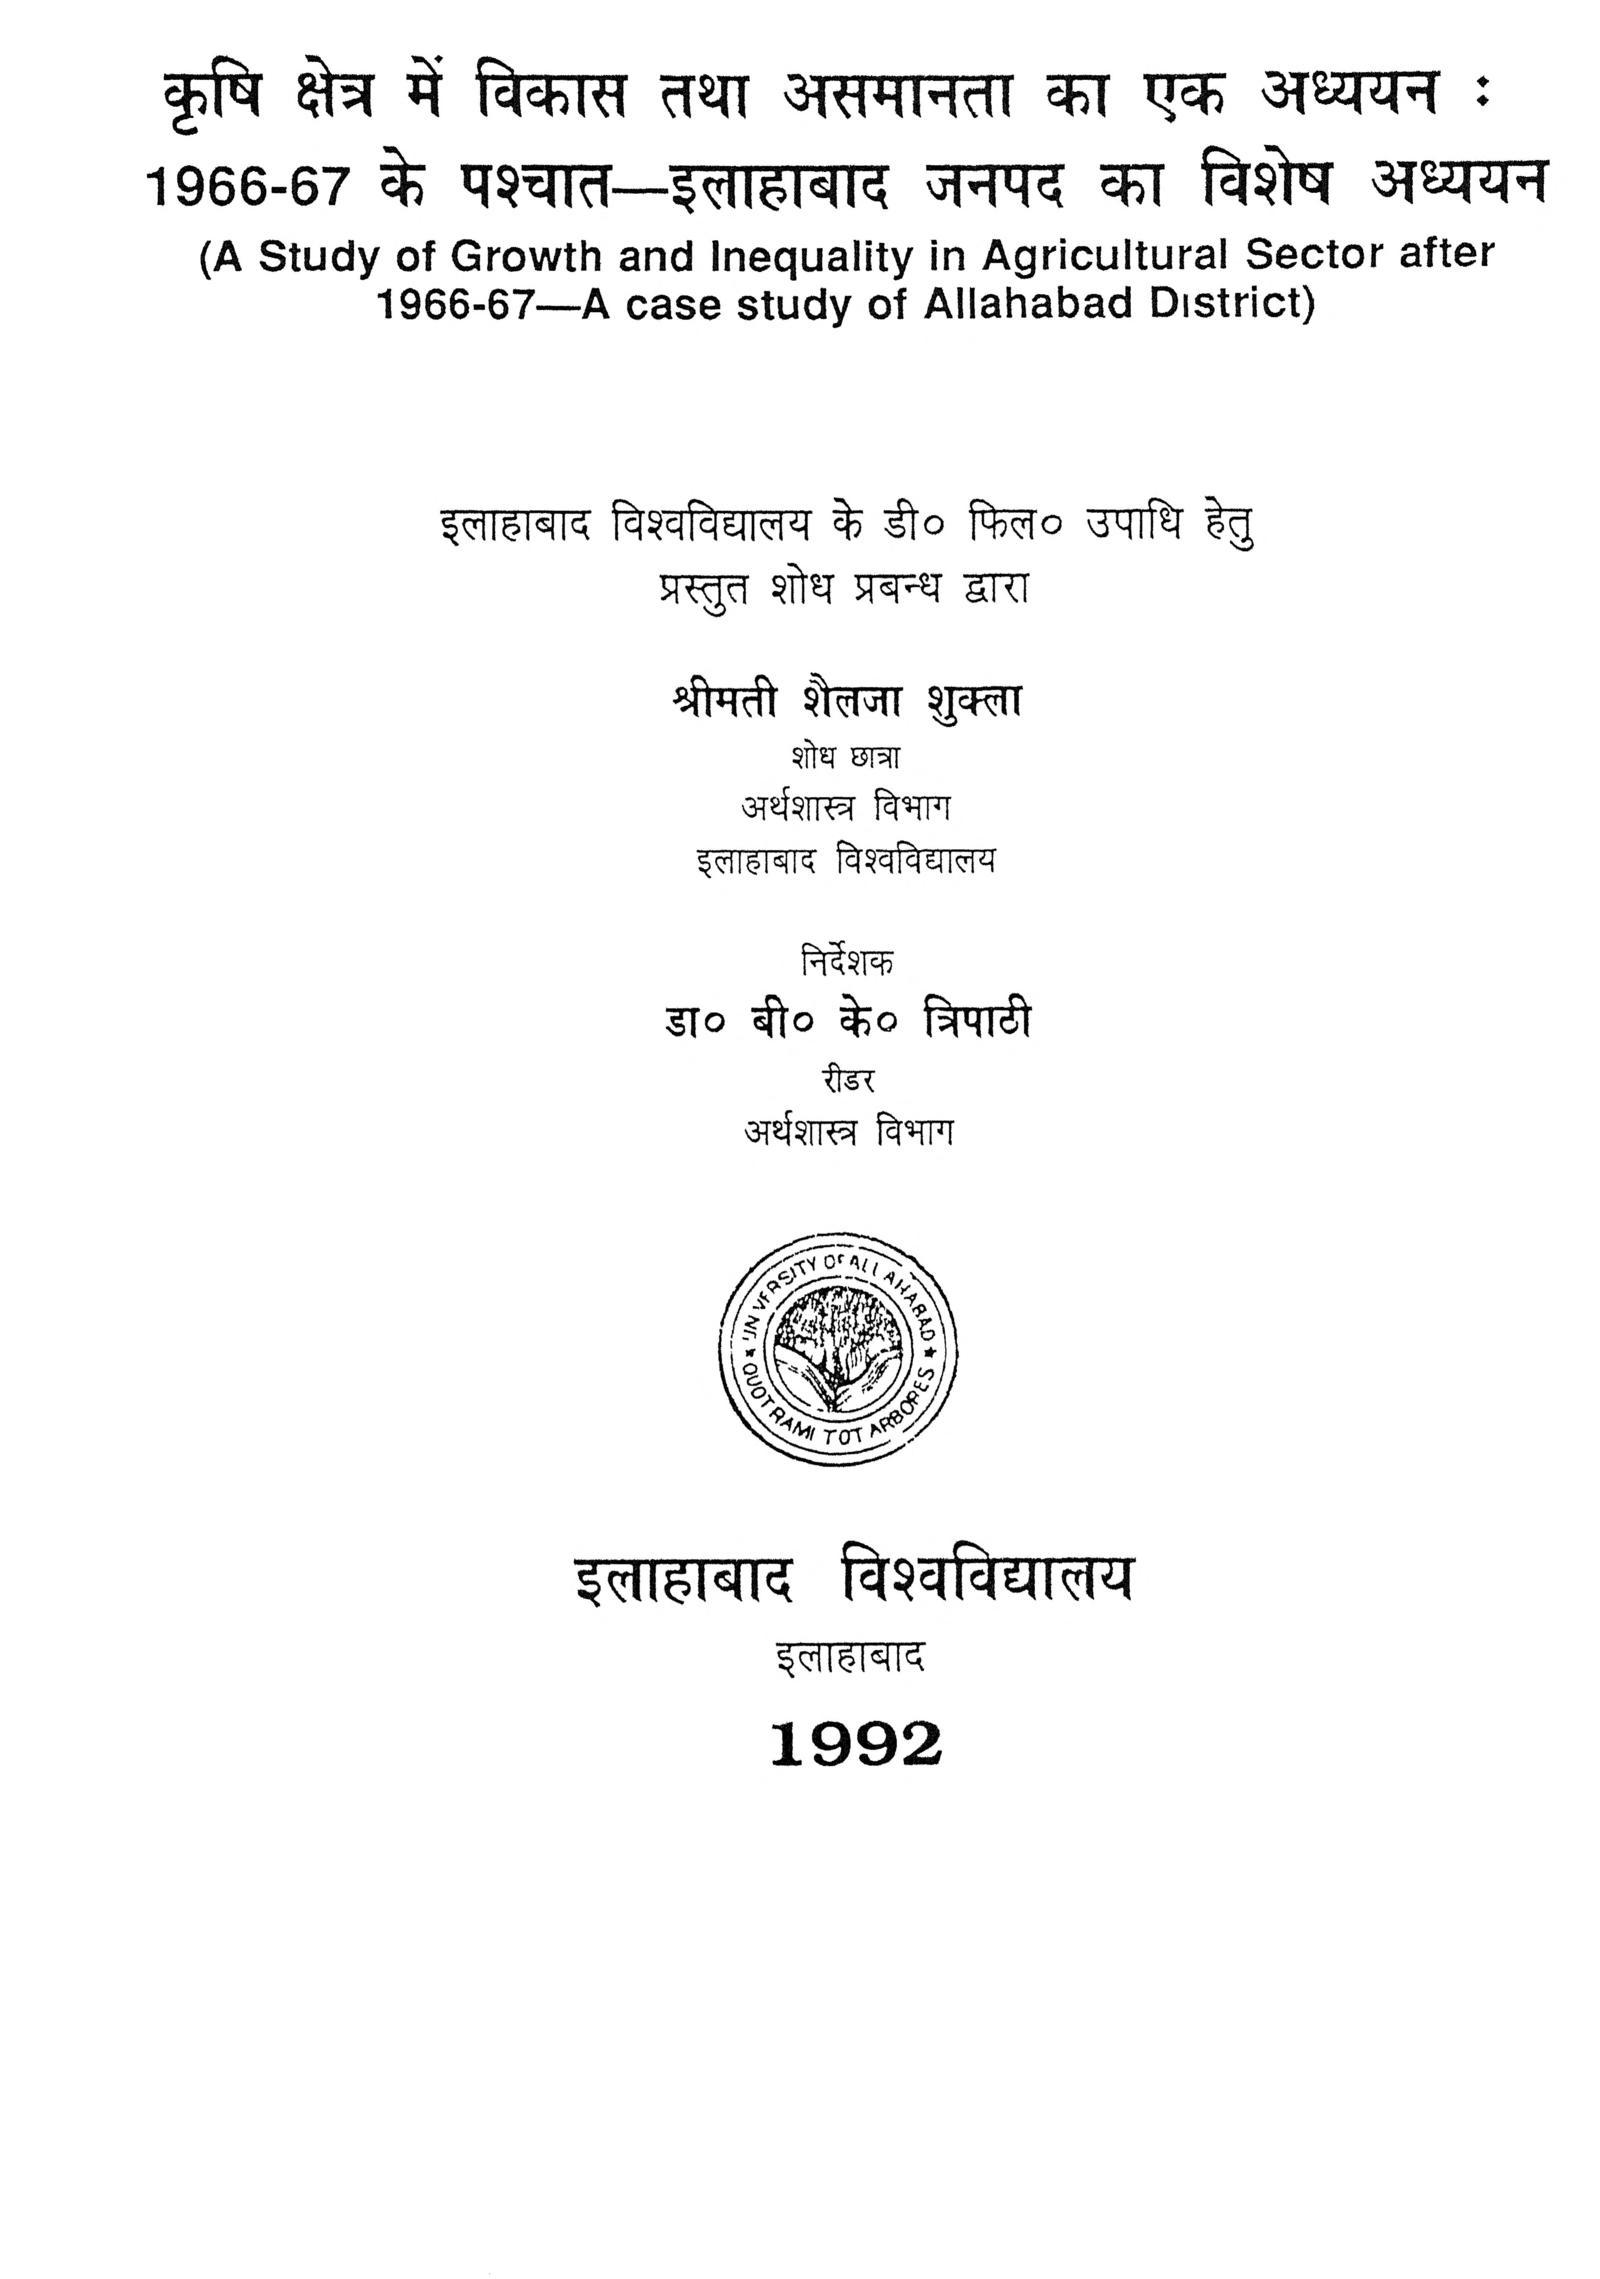 Krishi Kshetra Me Vikaas Tatha Asmaanta Ka Ek Addhyayan by शैलजा शुक्ला - Shailja Shukla